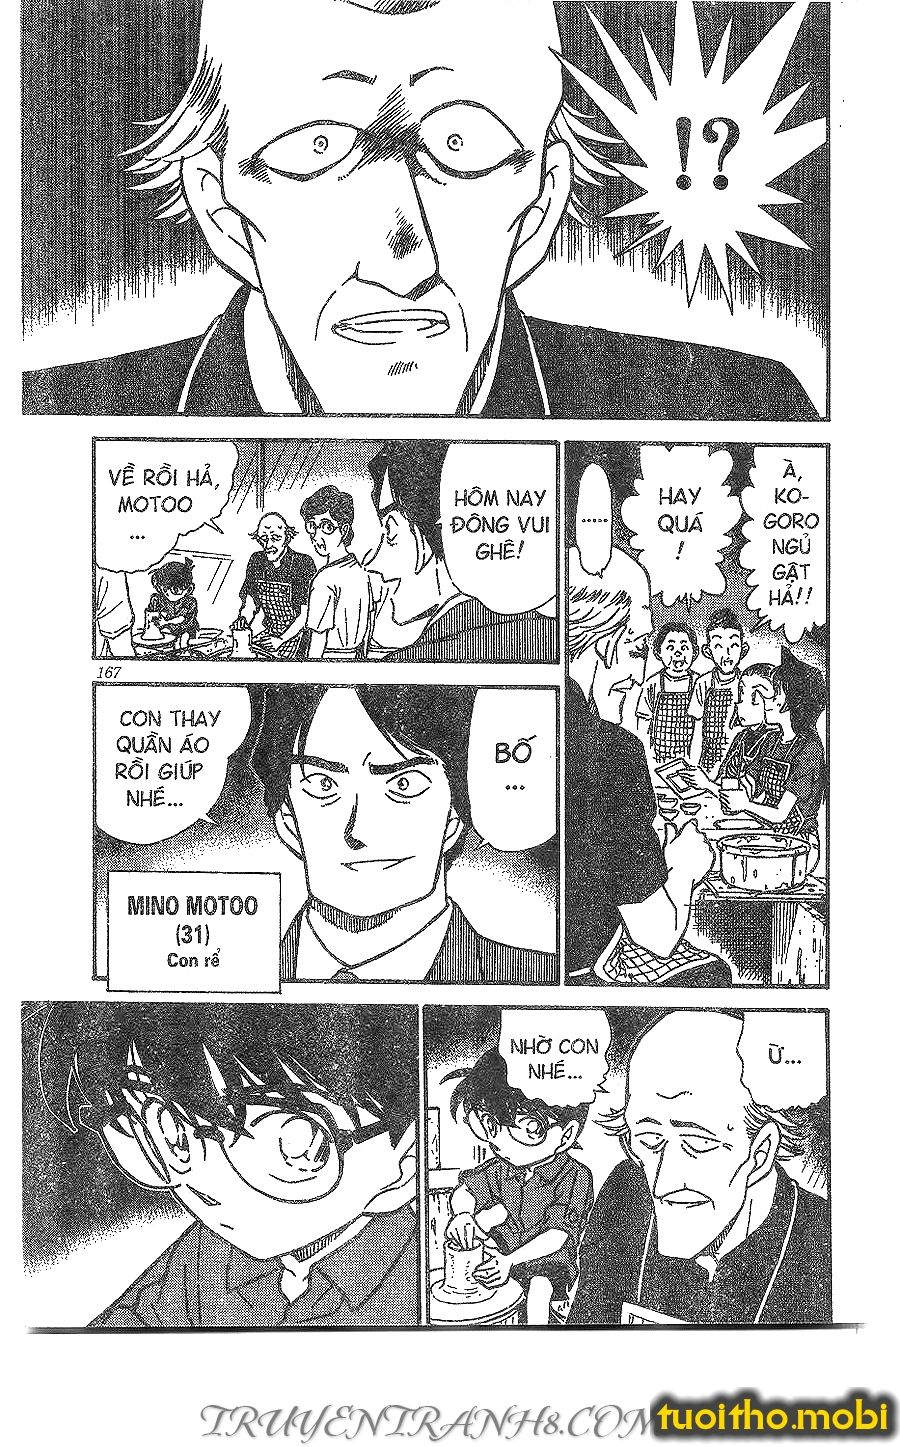 conan chương 305 trang 8